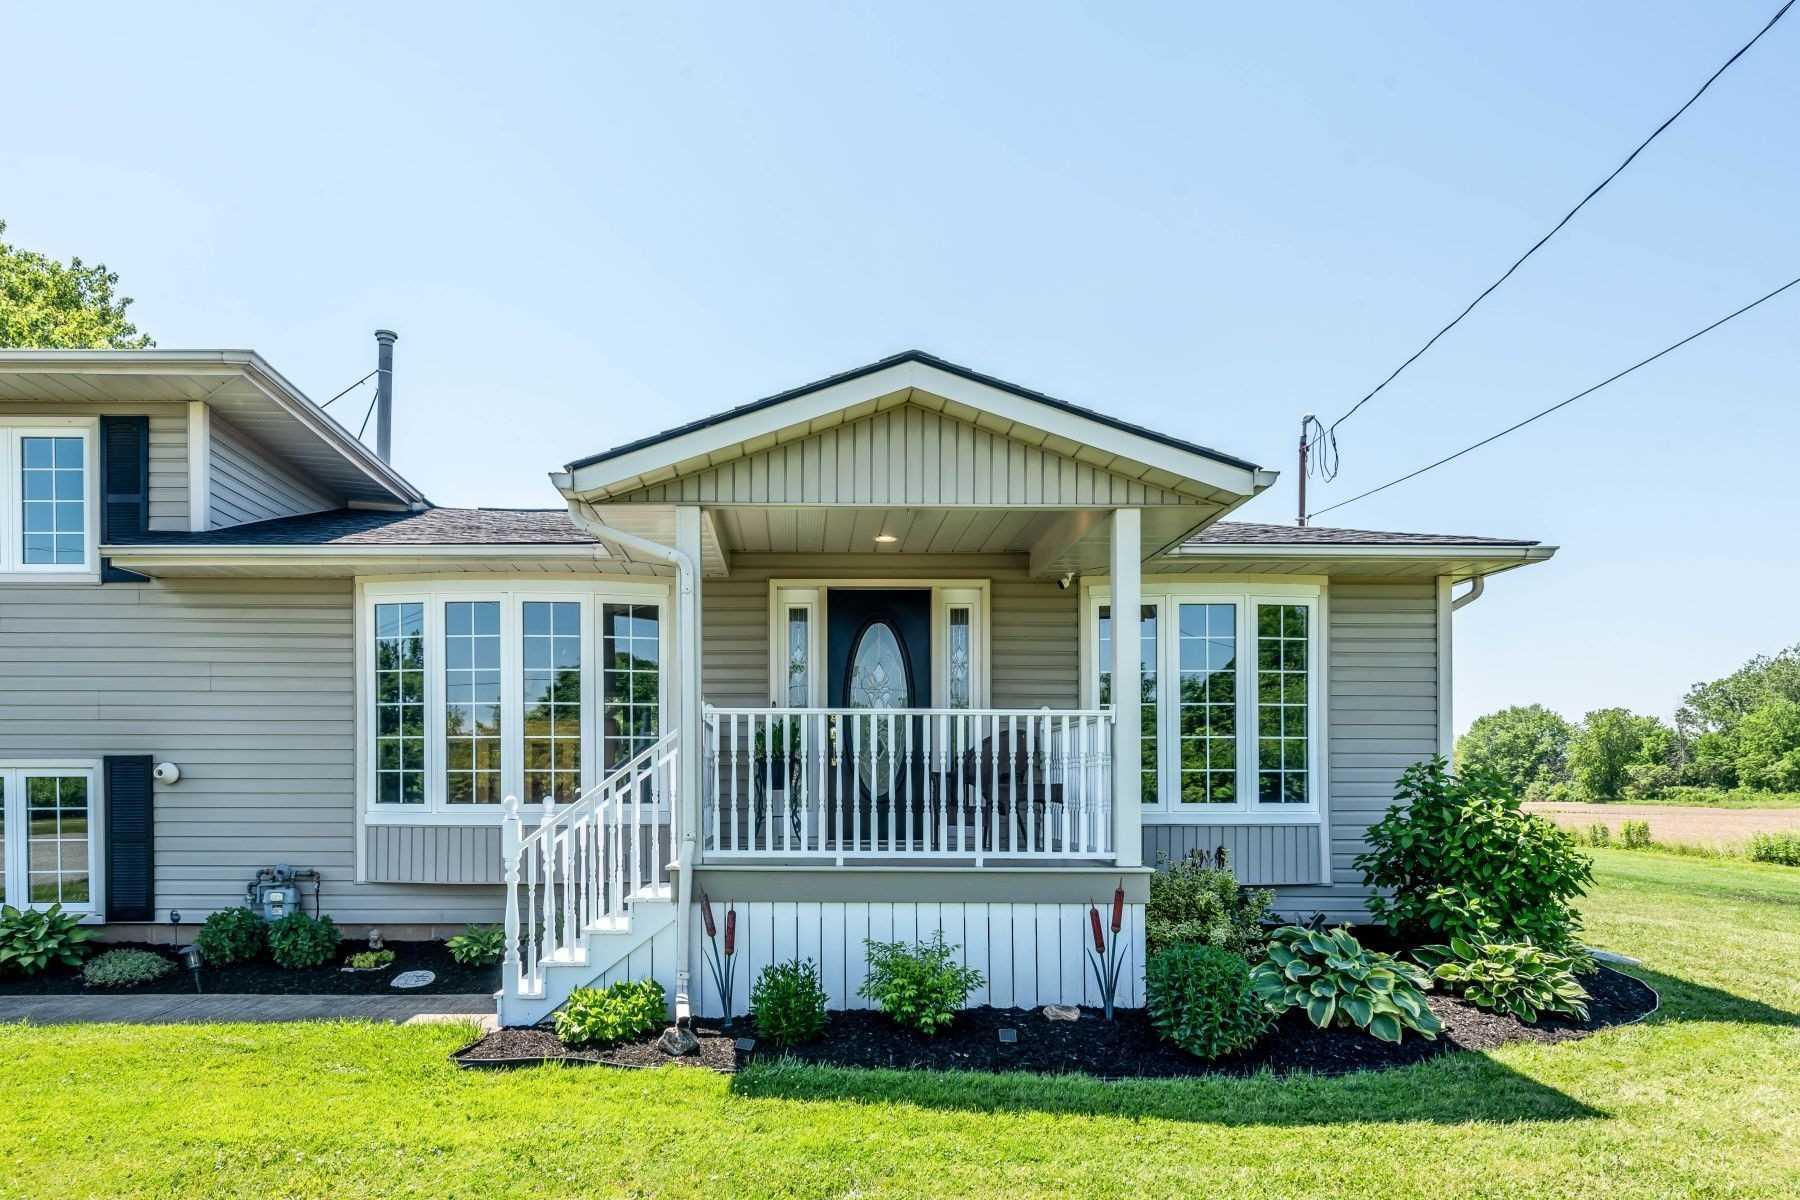 959 Clare Ave, Welland, Ontario L3C3C2, 3 Bedrooms Bedrooms, ,2 BathroomsBathrooms,Detached,For Sale,Clare,X5273103